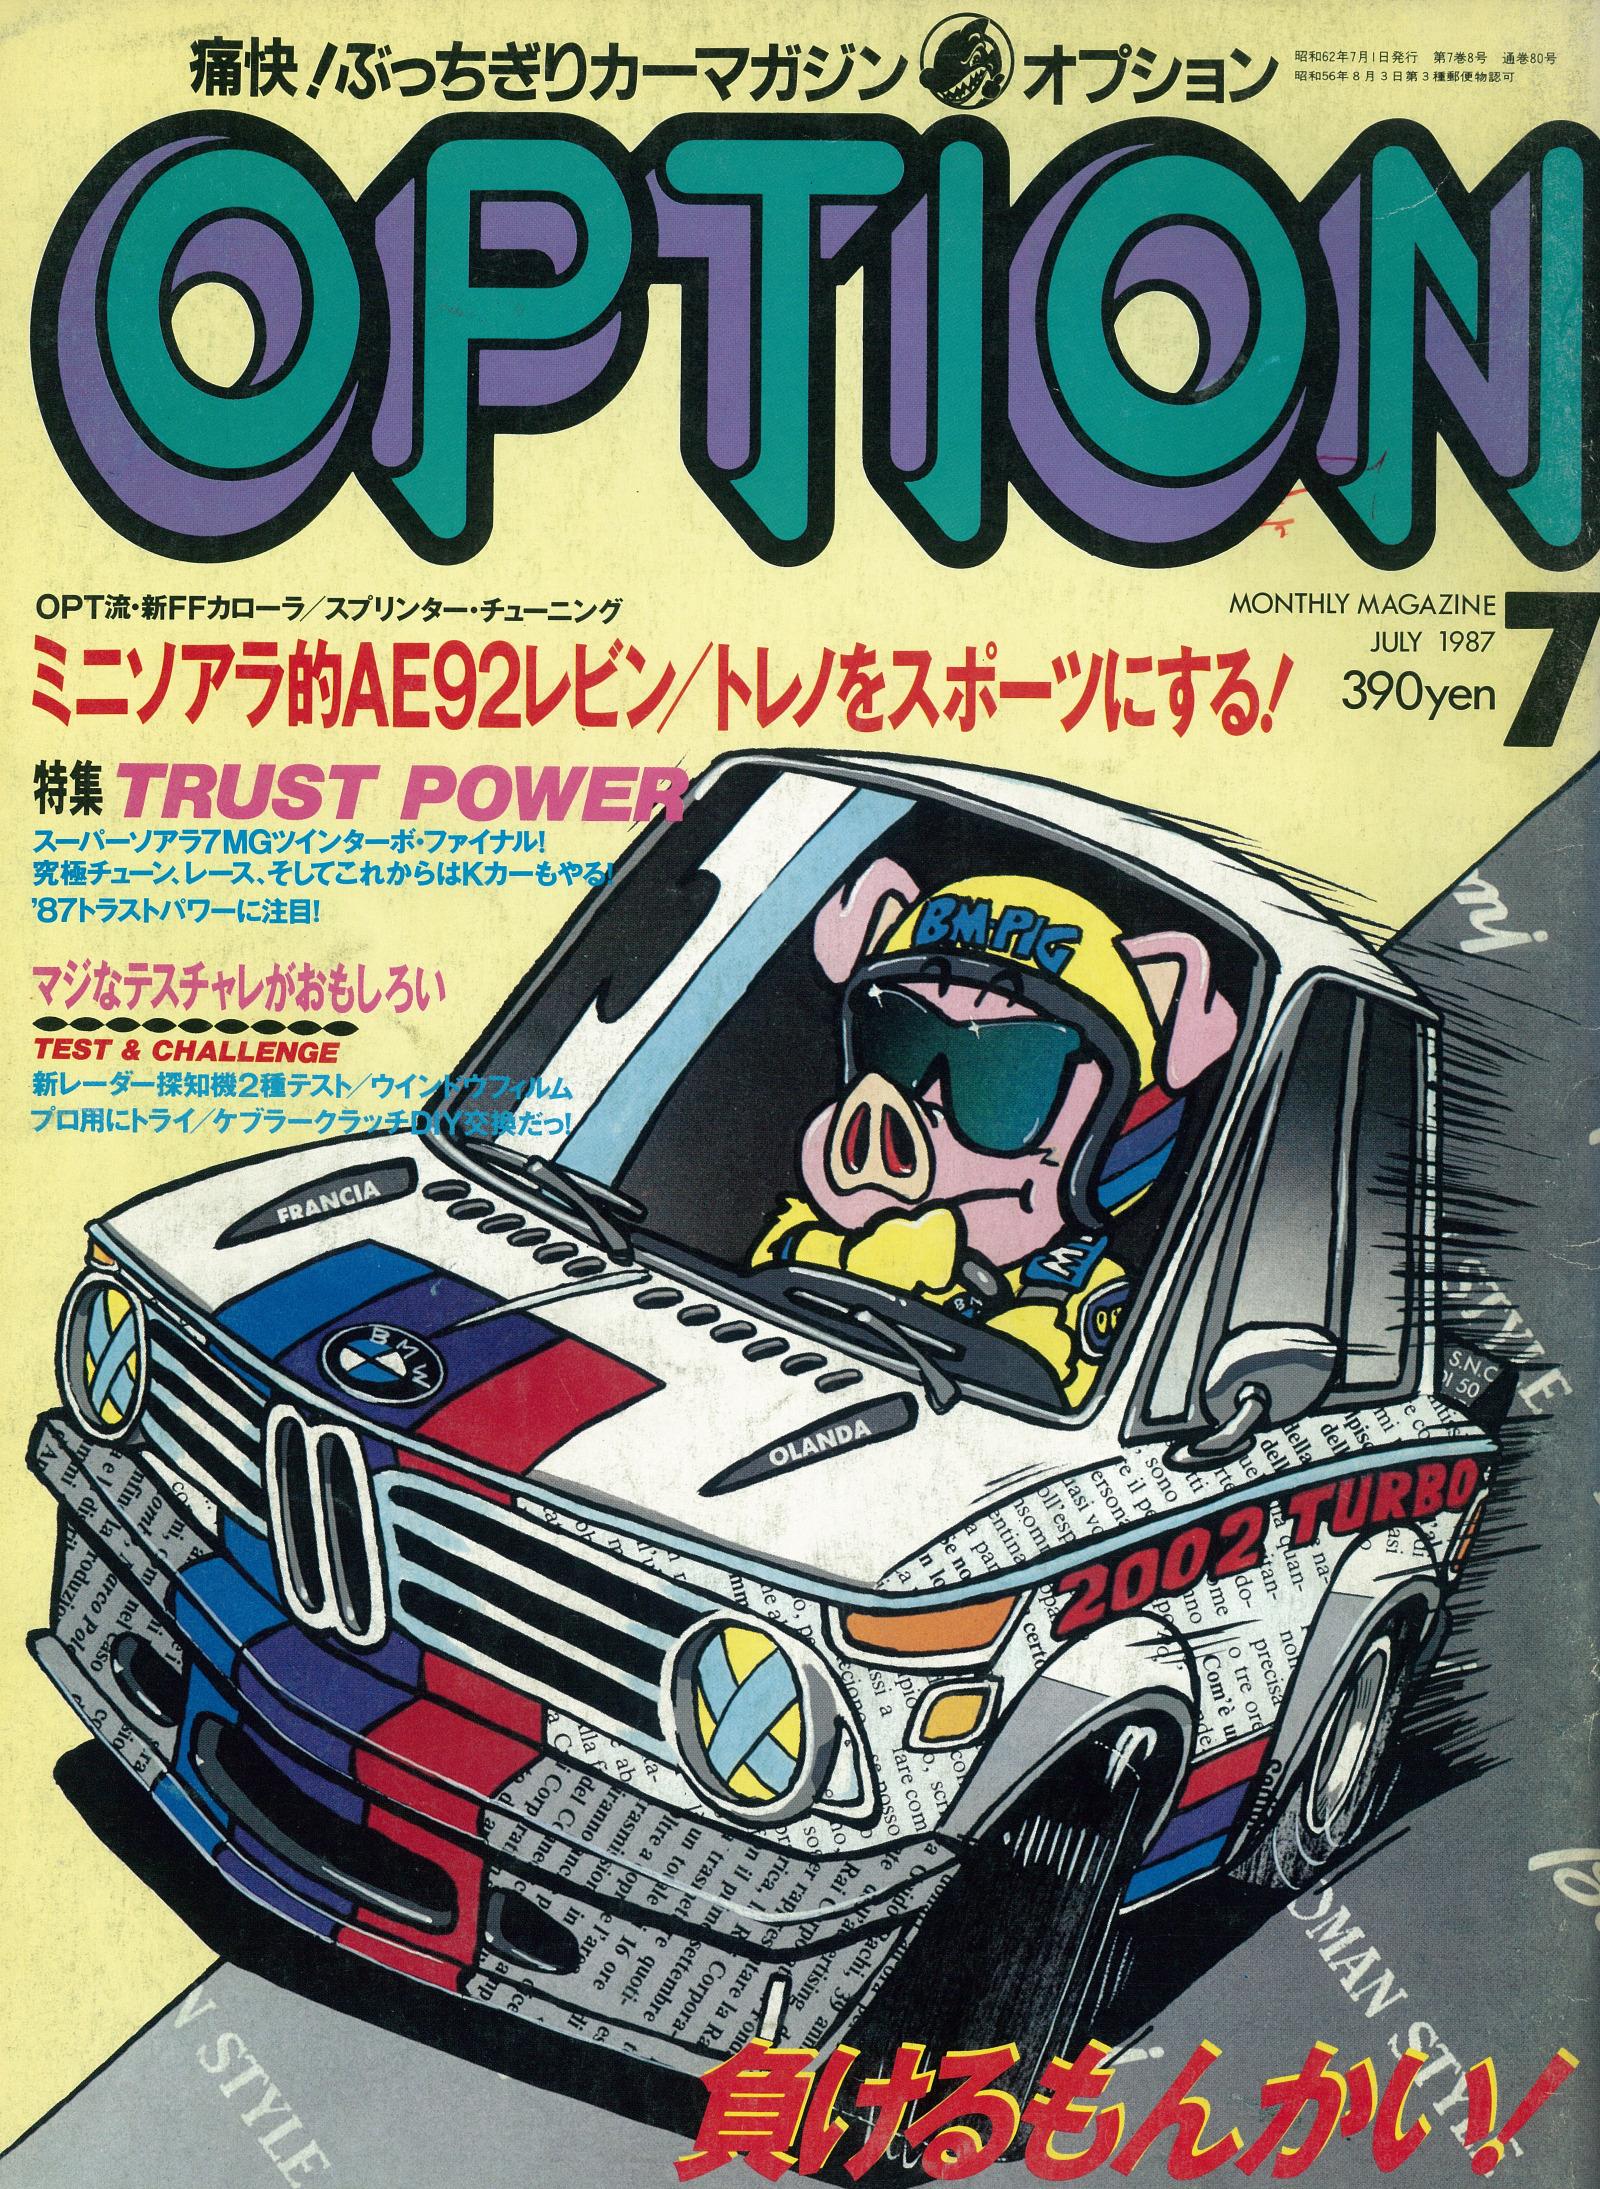 「RE雨宮ロータスヨーロッパ改13Bペリは、今見ても異次元のスーパーマシン【OPTION 1987年7月号より】」の8枚目の画像